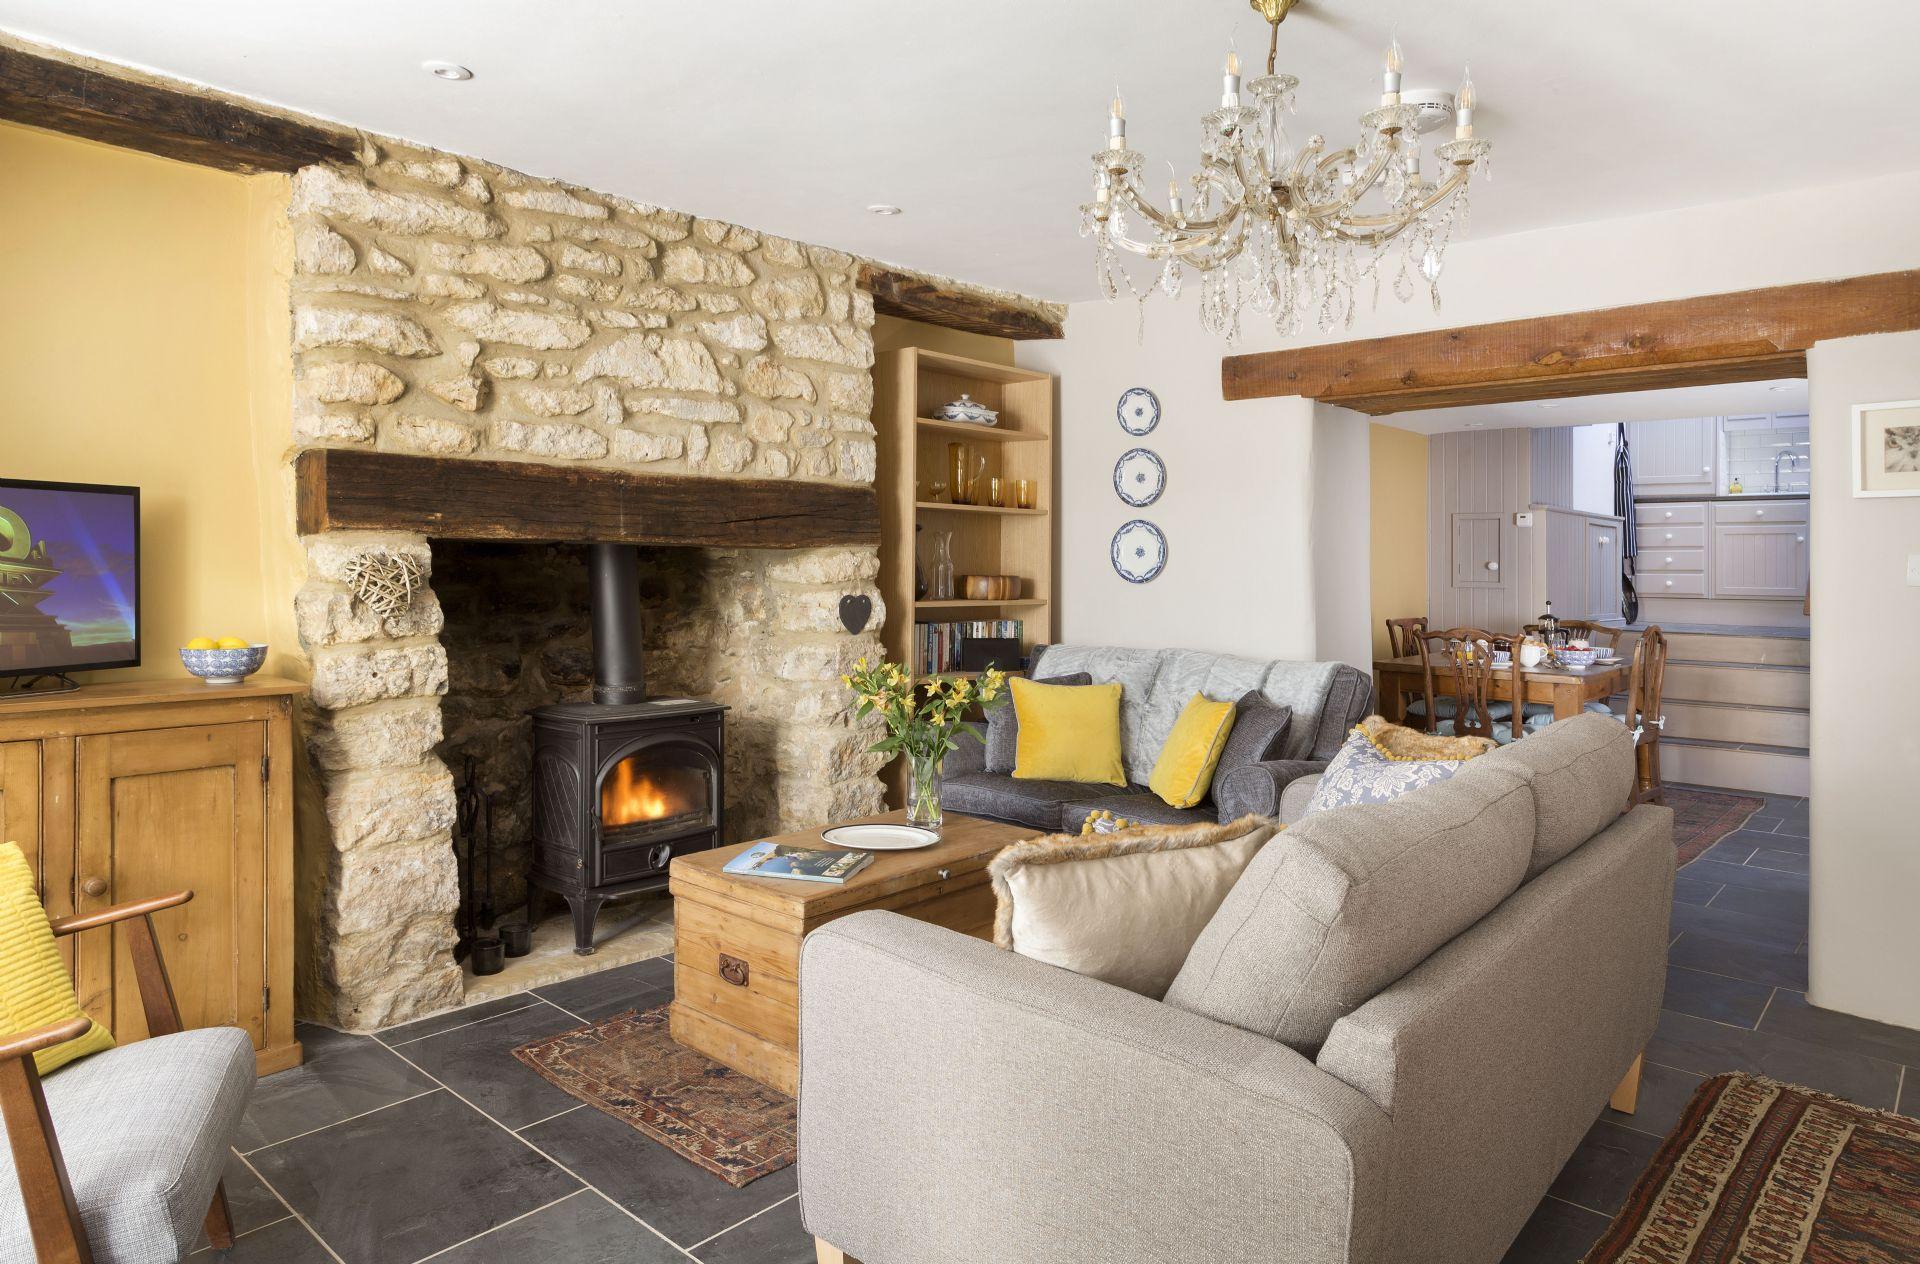 Ground floor: Sitting room with wood burner